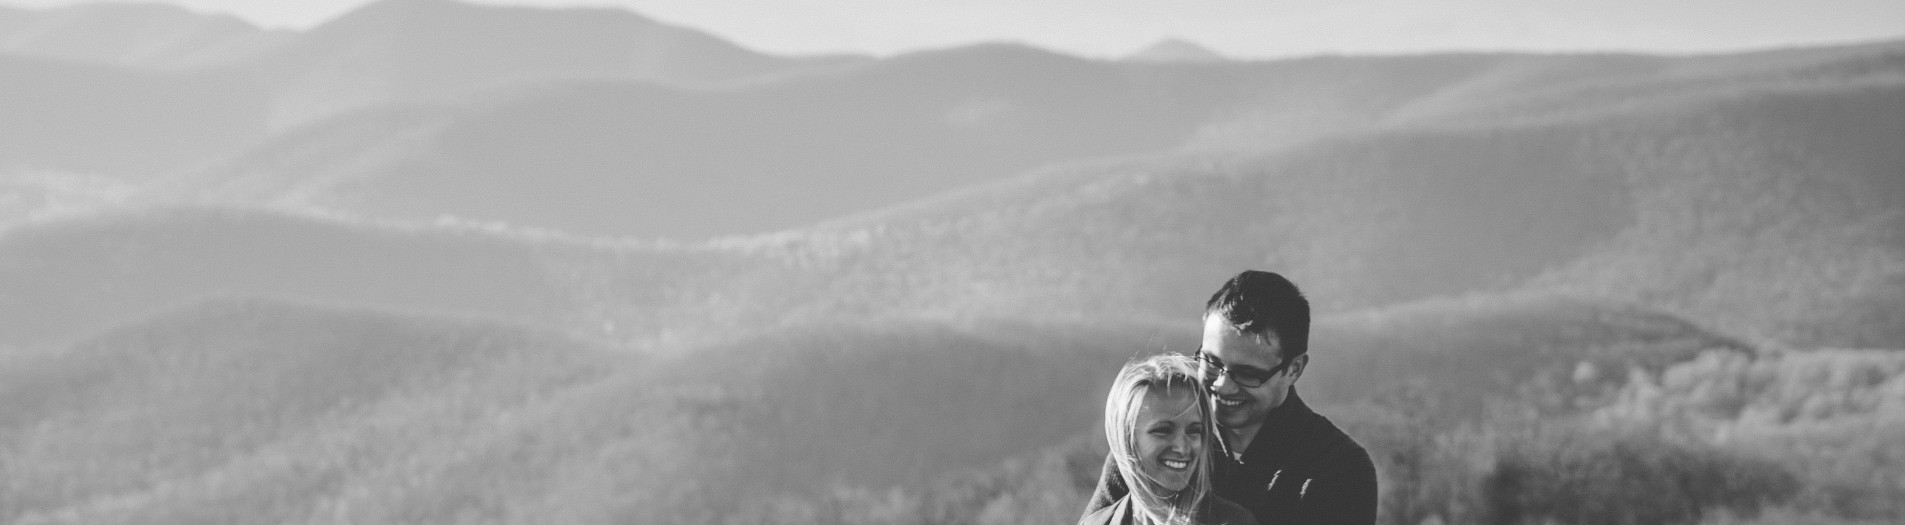 Brittany + Rob | Shenandoah National Park Engagement